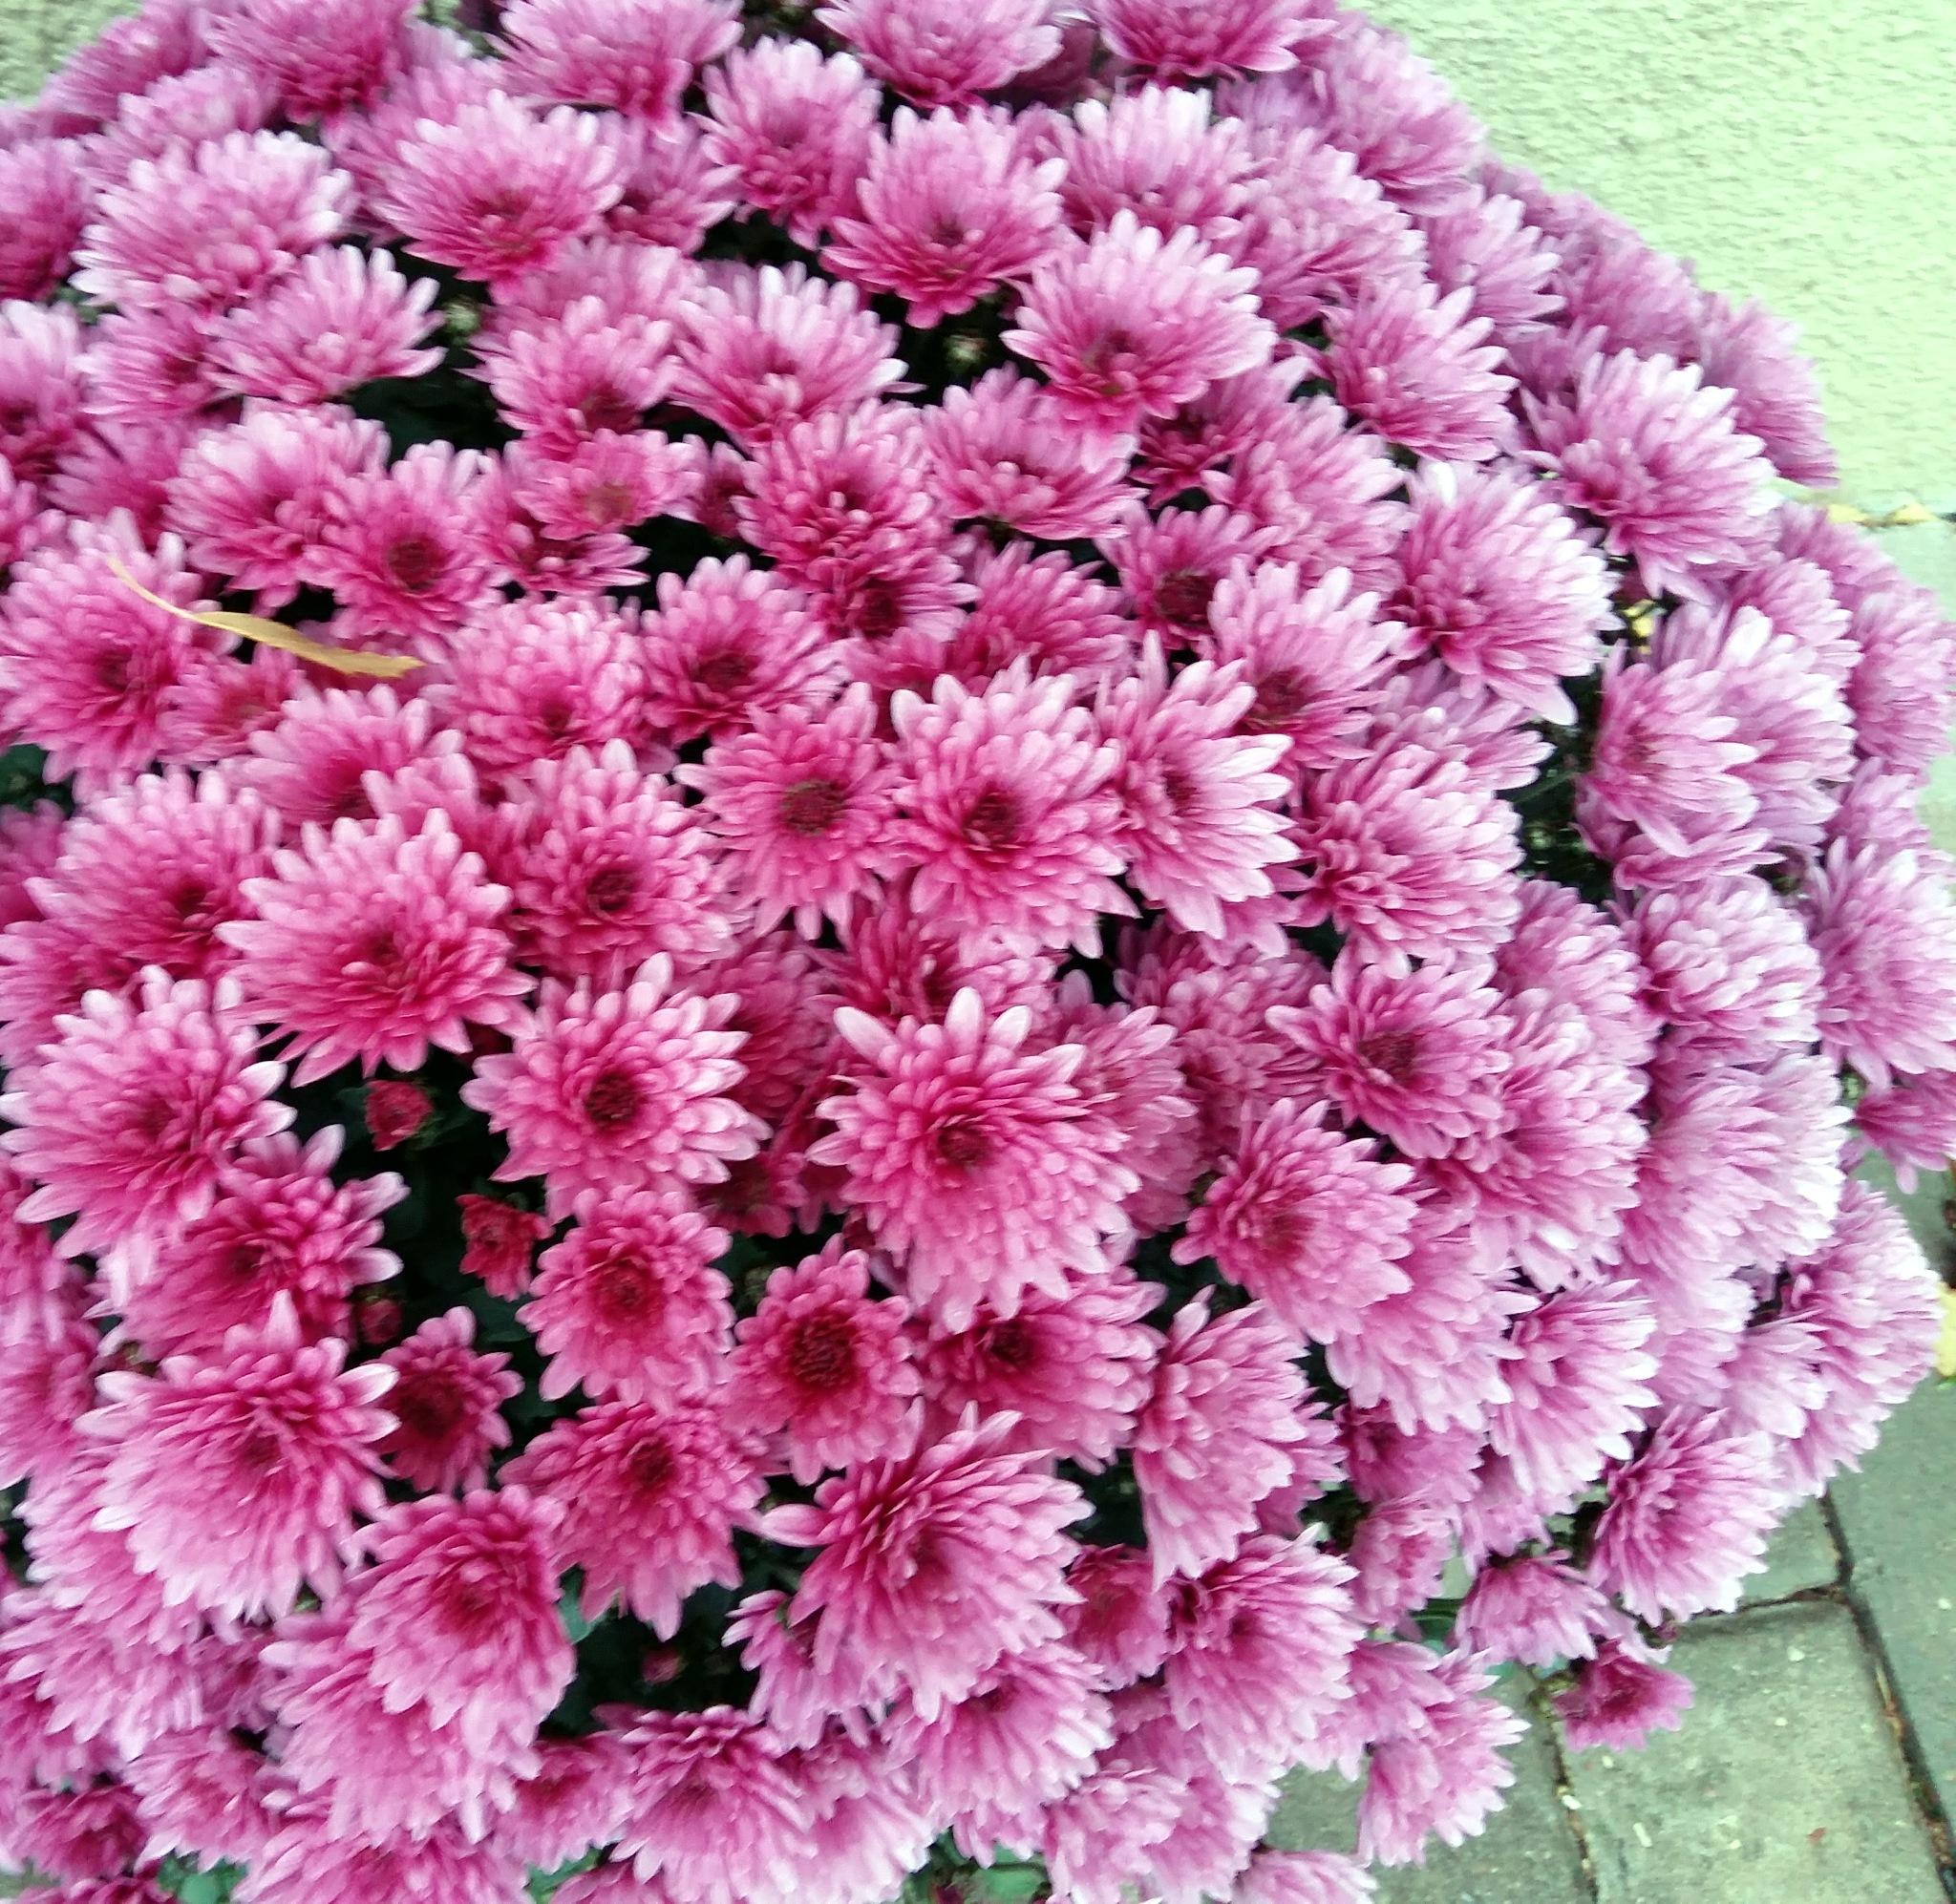 Many flowers by uzkuraitiene62